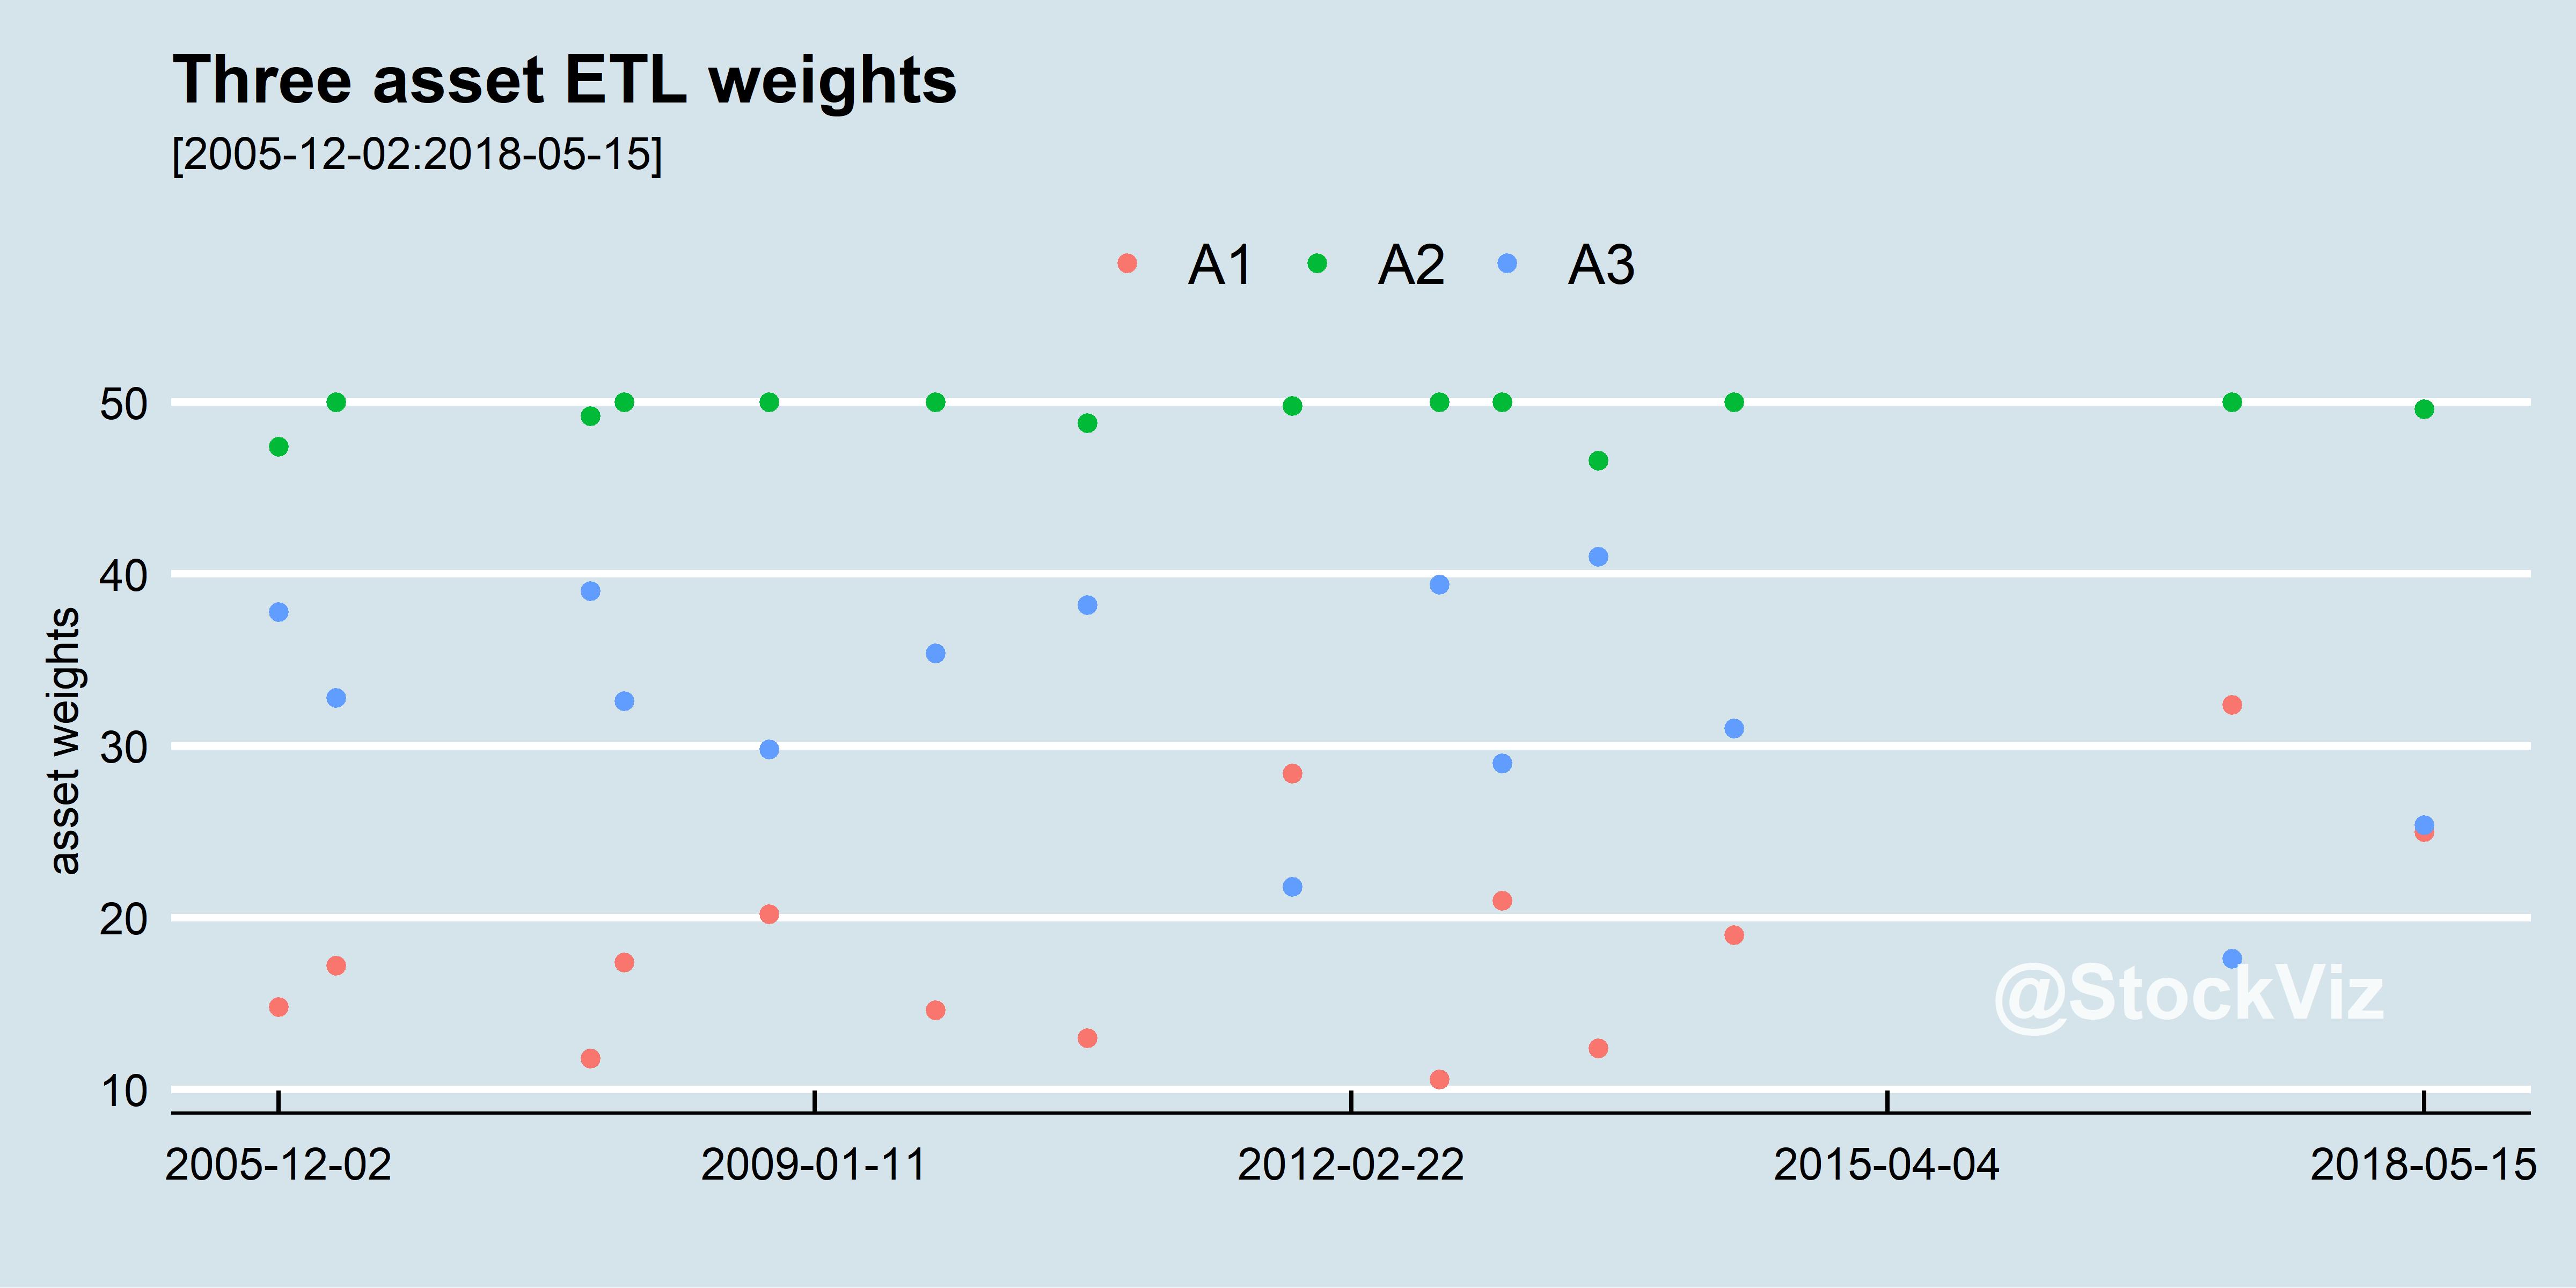 min-etl 3-asset portfolio (NIFTY MIDCAP, 0-5yr bond, NASDAQ-100) asset weights